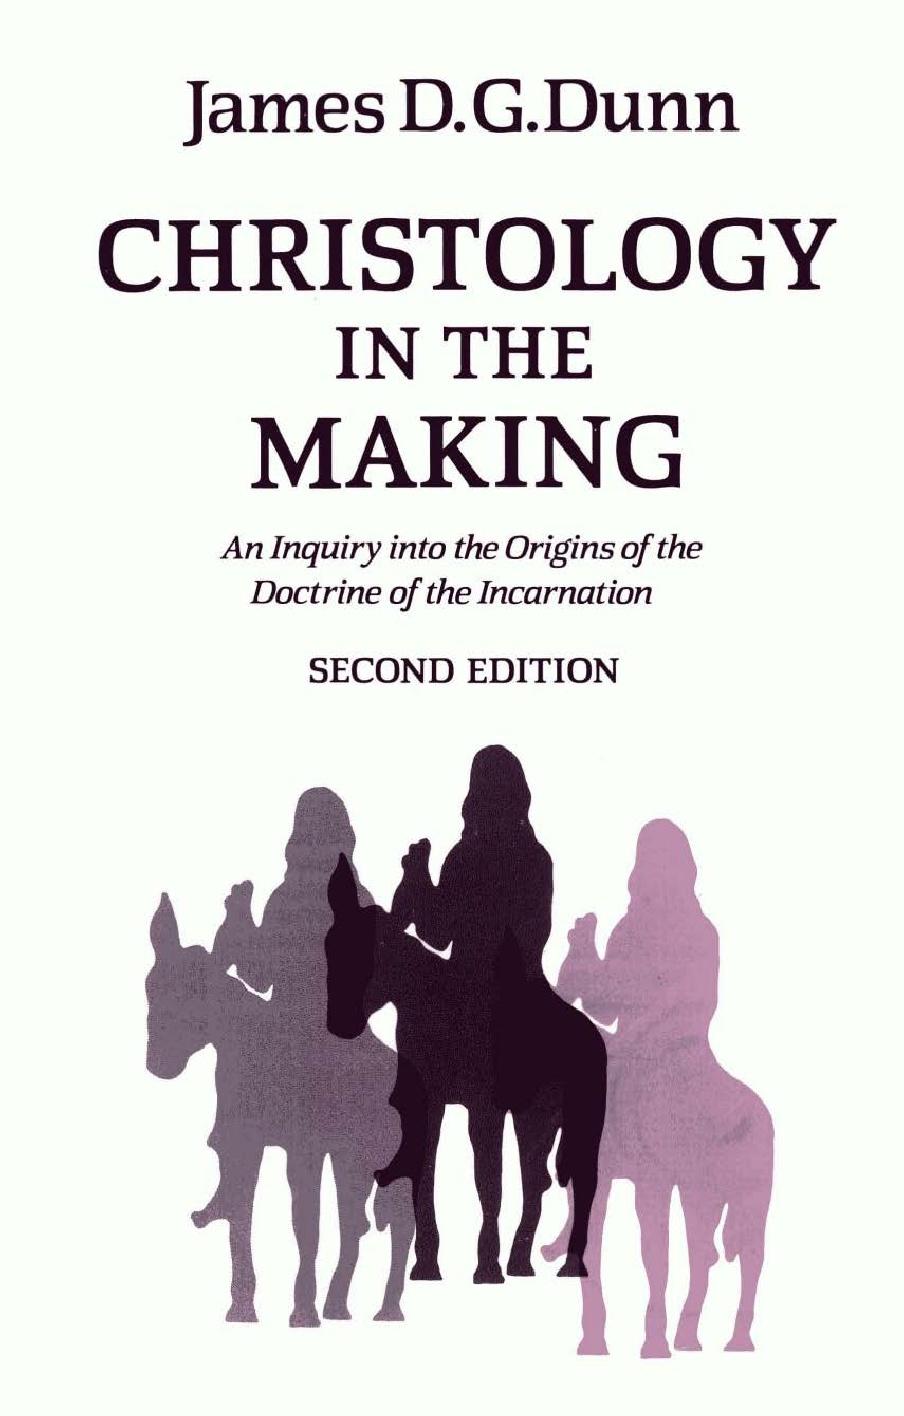 James D.G. Dunn-Christology In The Making-